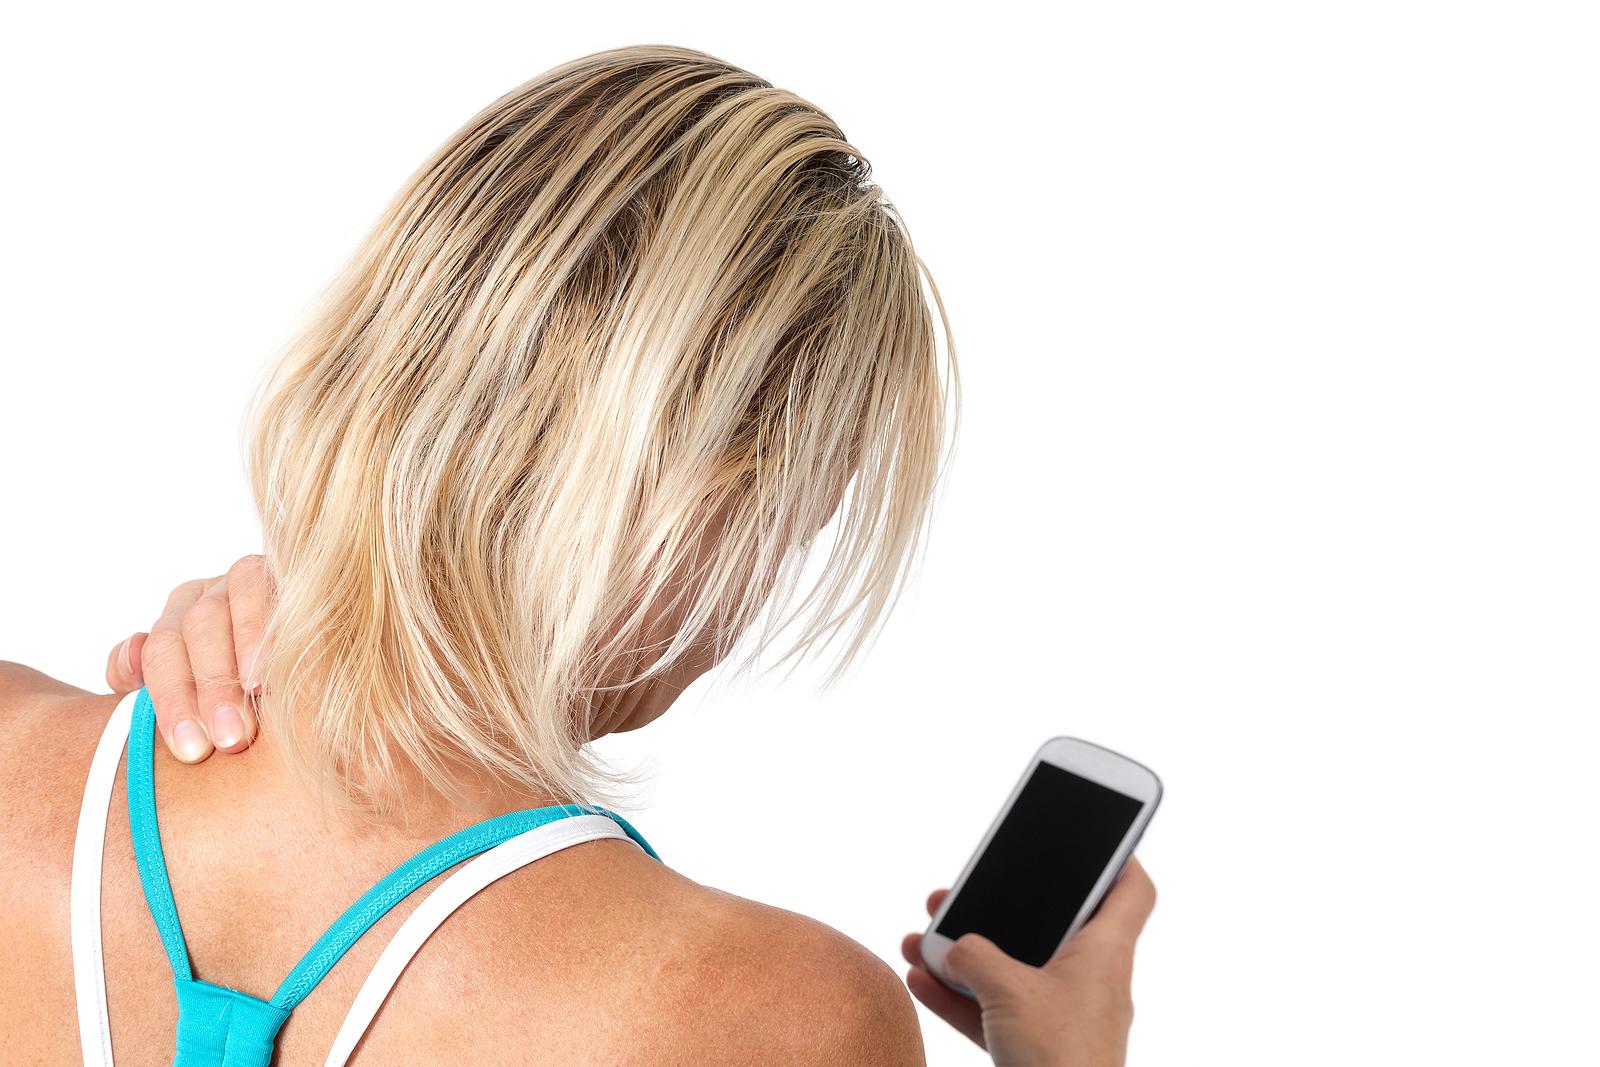 Text Neck Causes Soreness